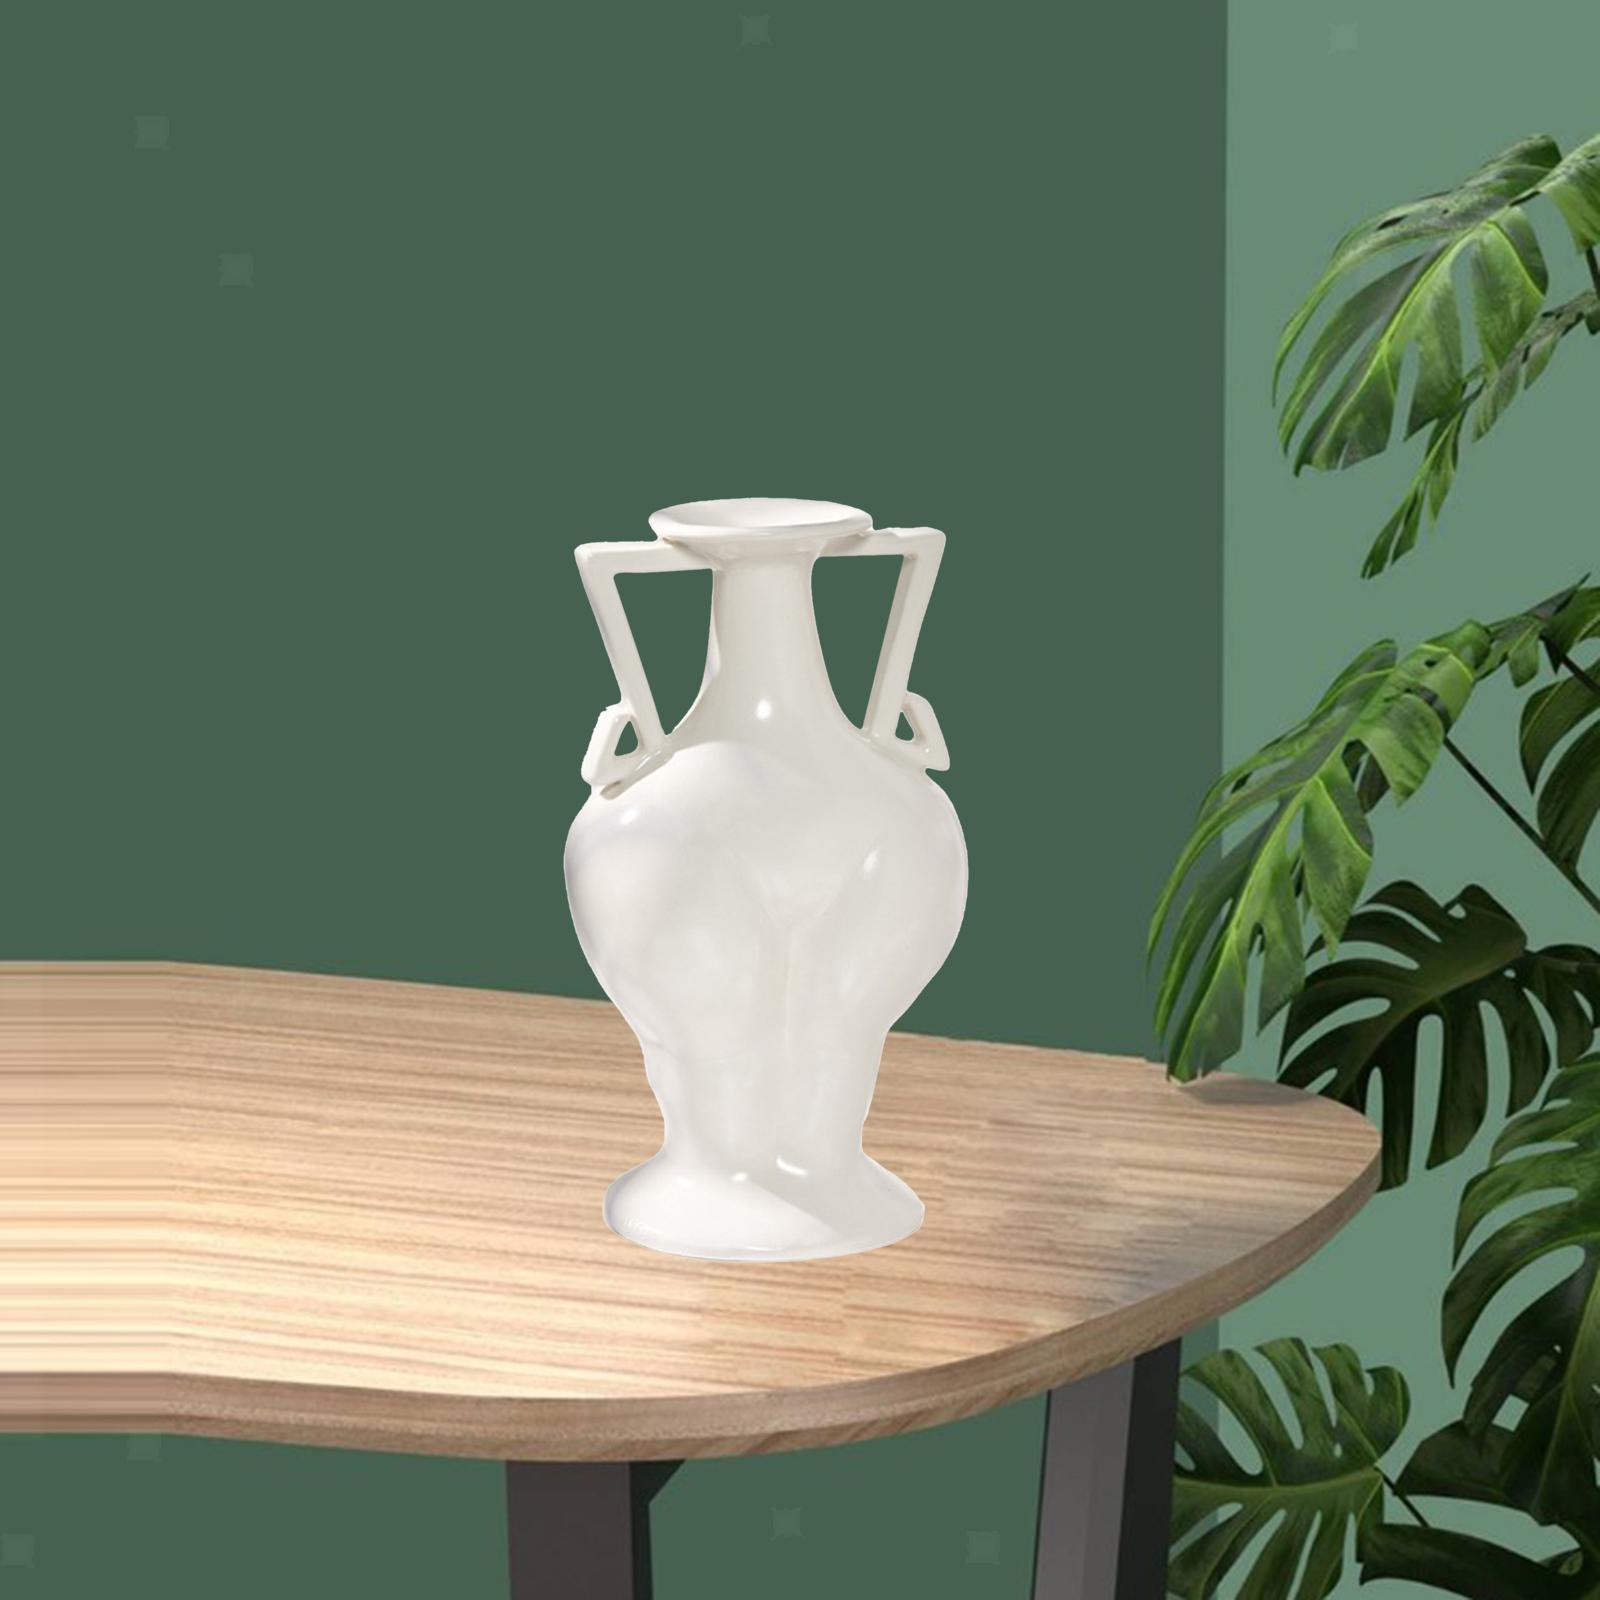 Indexbild 36 - Blumenvase Keramik Blumentöpfe Trockenblumenhalter Pflanzenvasen Wohnkultur